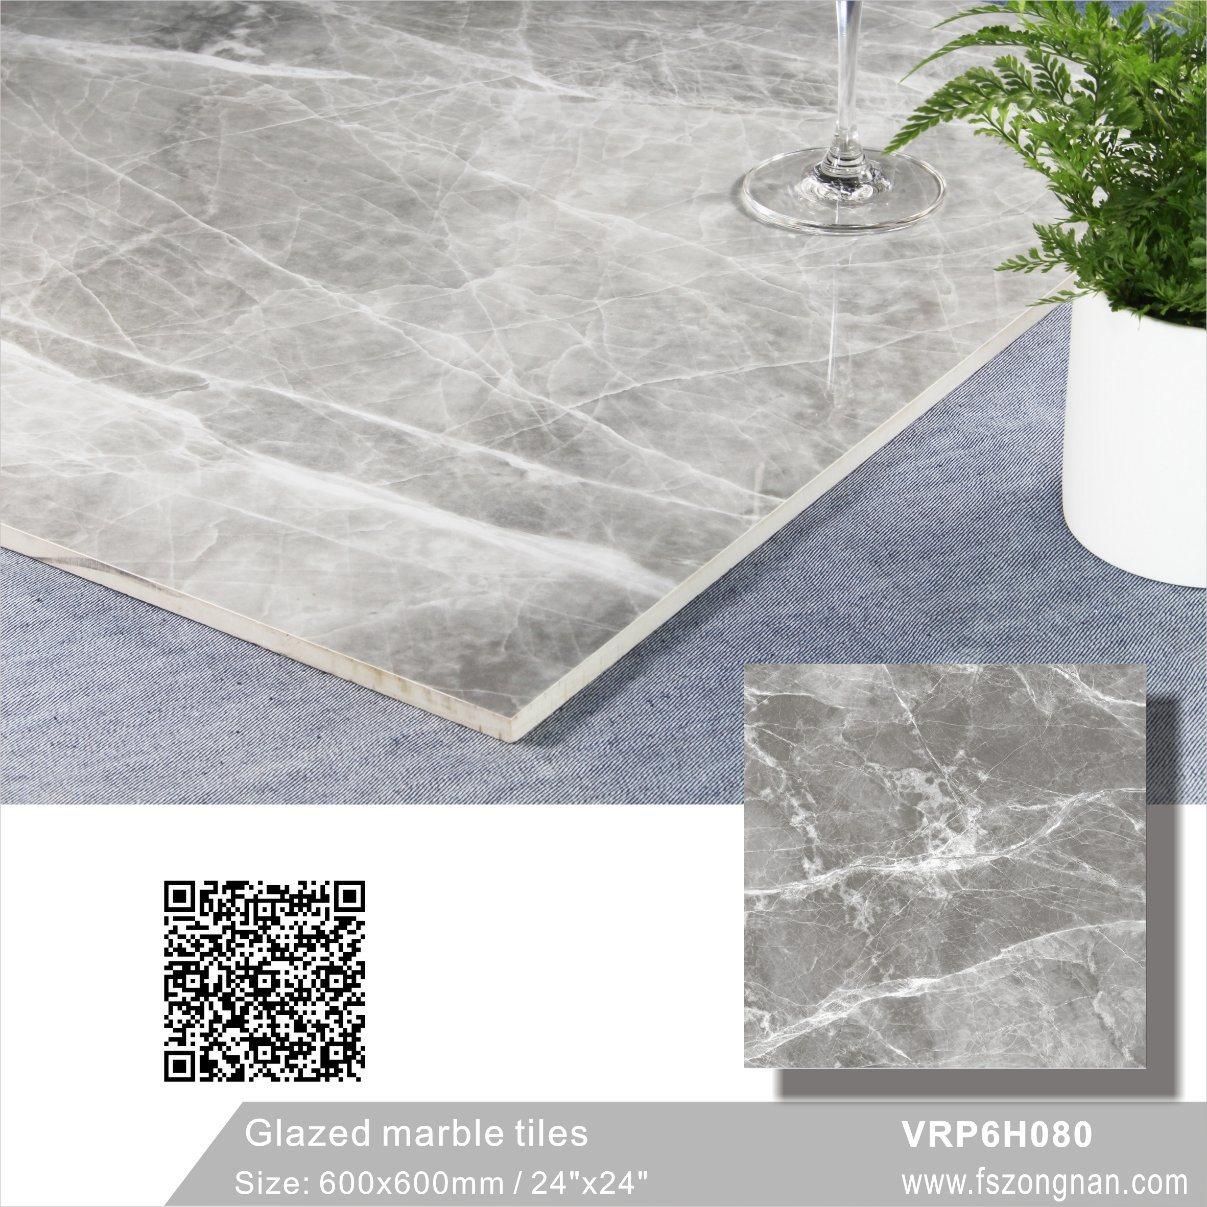 China Glazed Marble Polished Porcelain Bathroom Flooring Tile ...